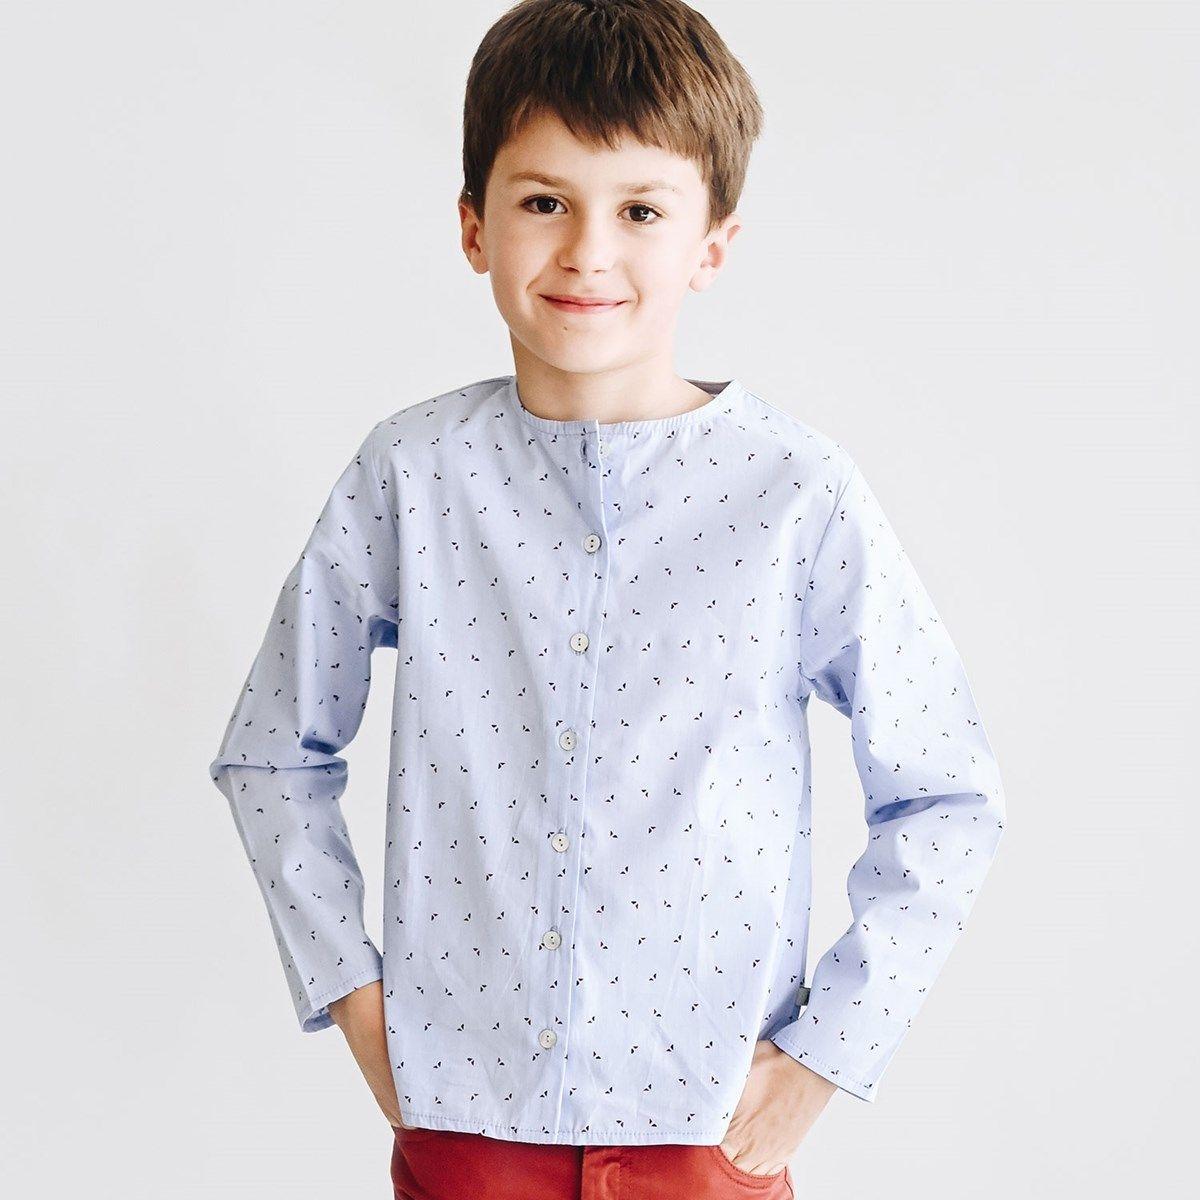 Chemise garçon bleu et triangles